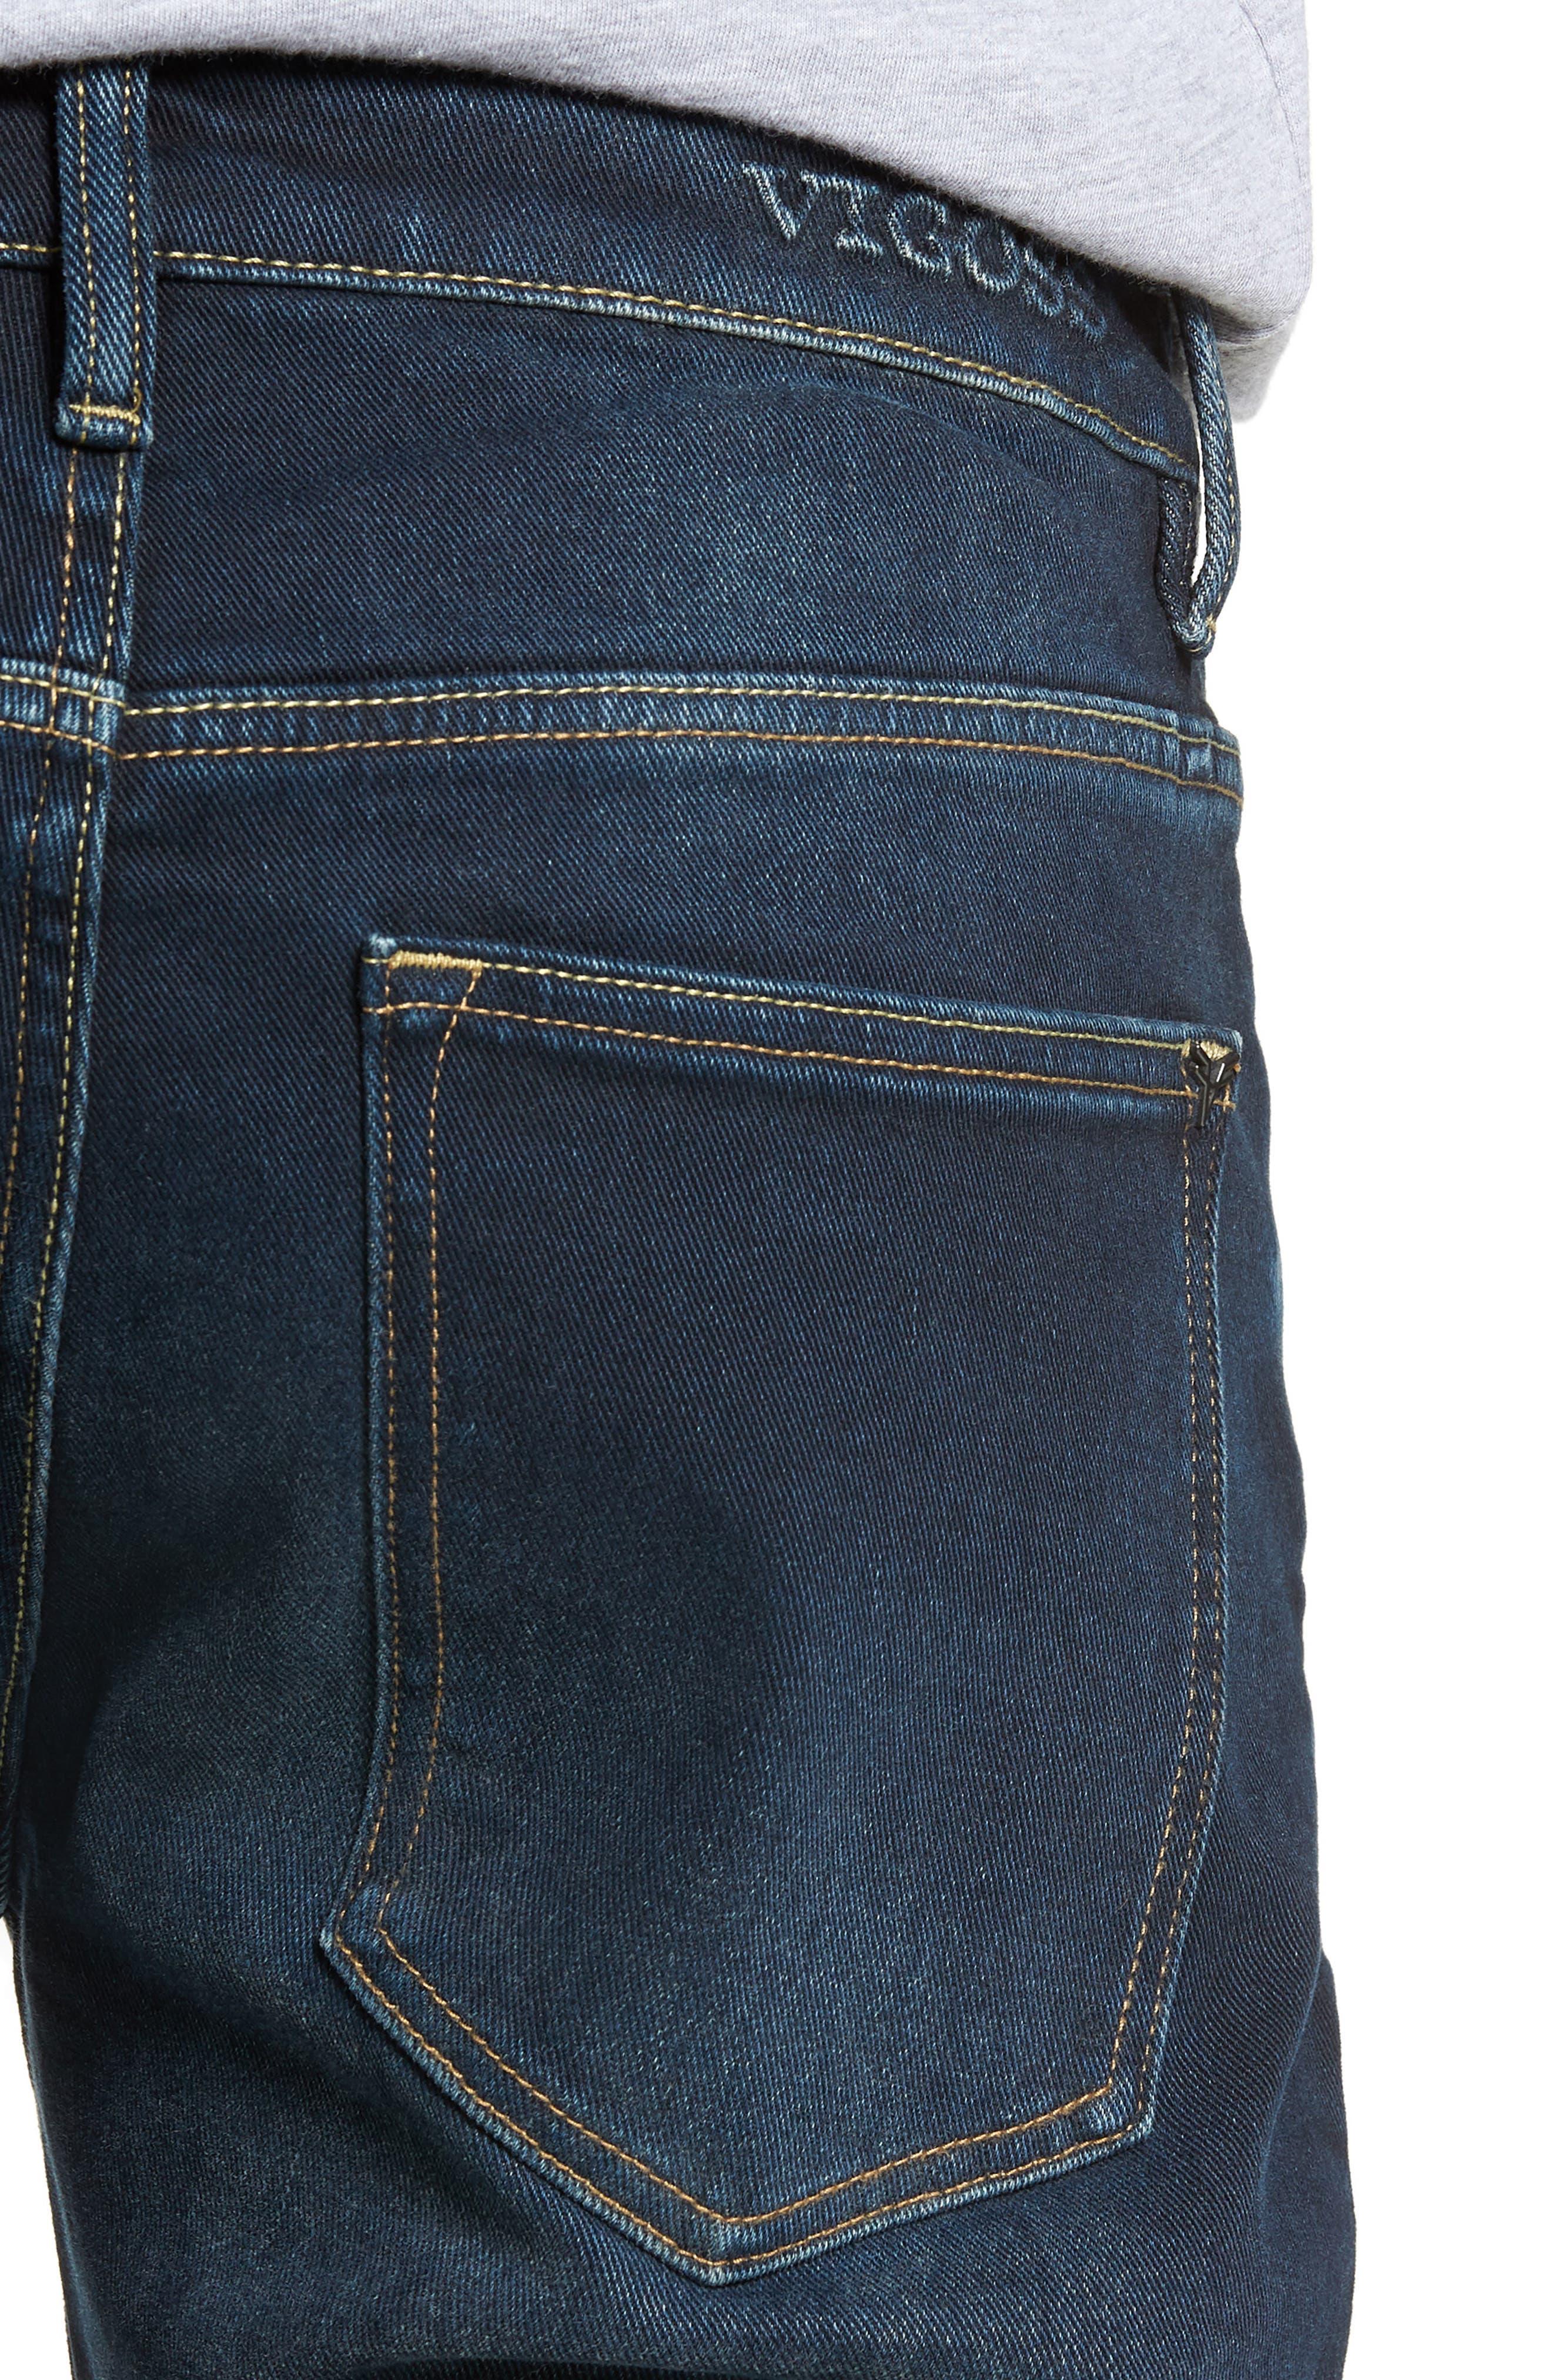 Jude Slim Fit Jeans,                             Alternate thumbnail 4, color,                             DARK 3D WASH